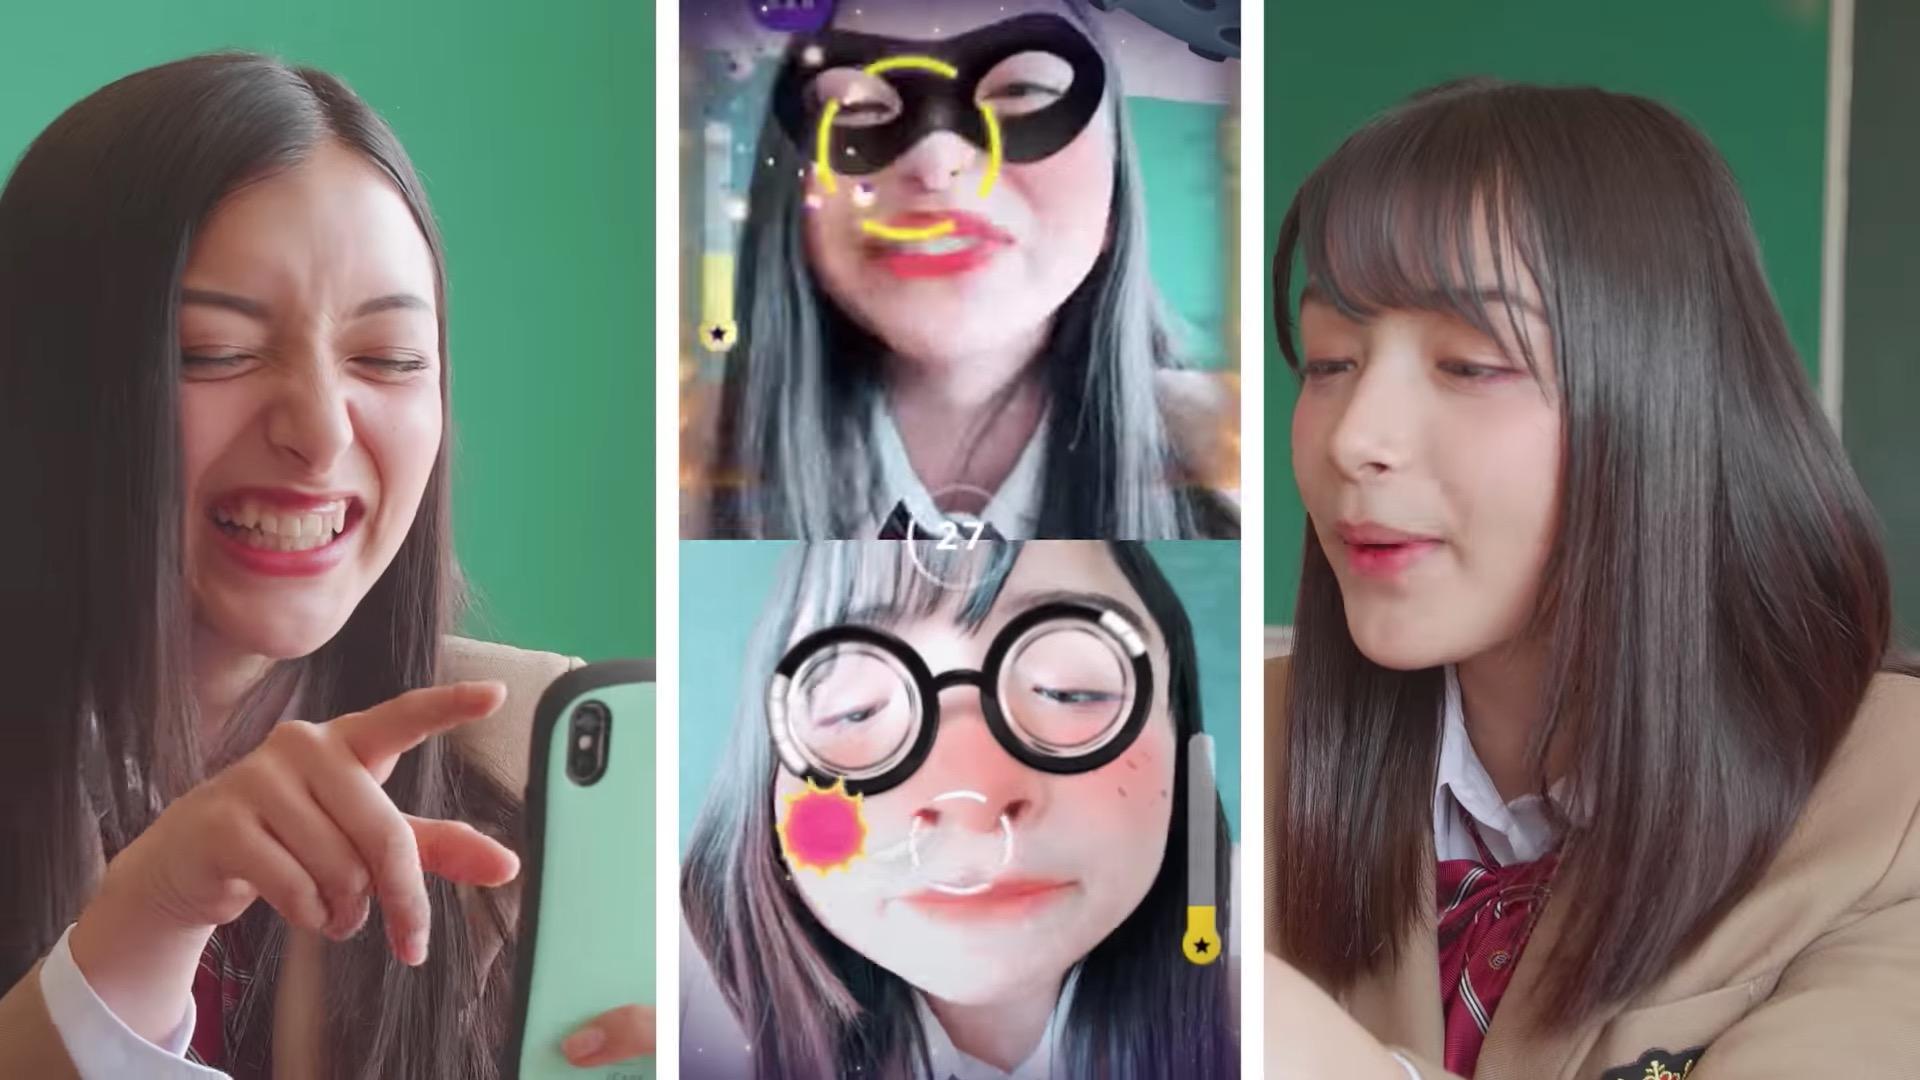 LINE、ビデオ通話を使った新感覚・顔ゲーム「Face Play」が登場